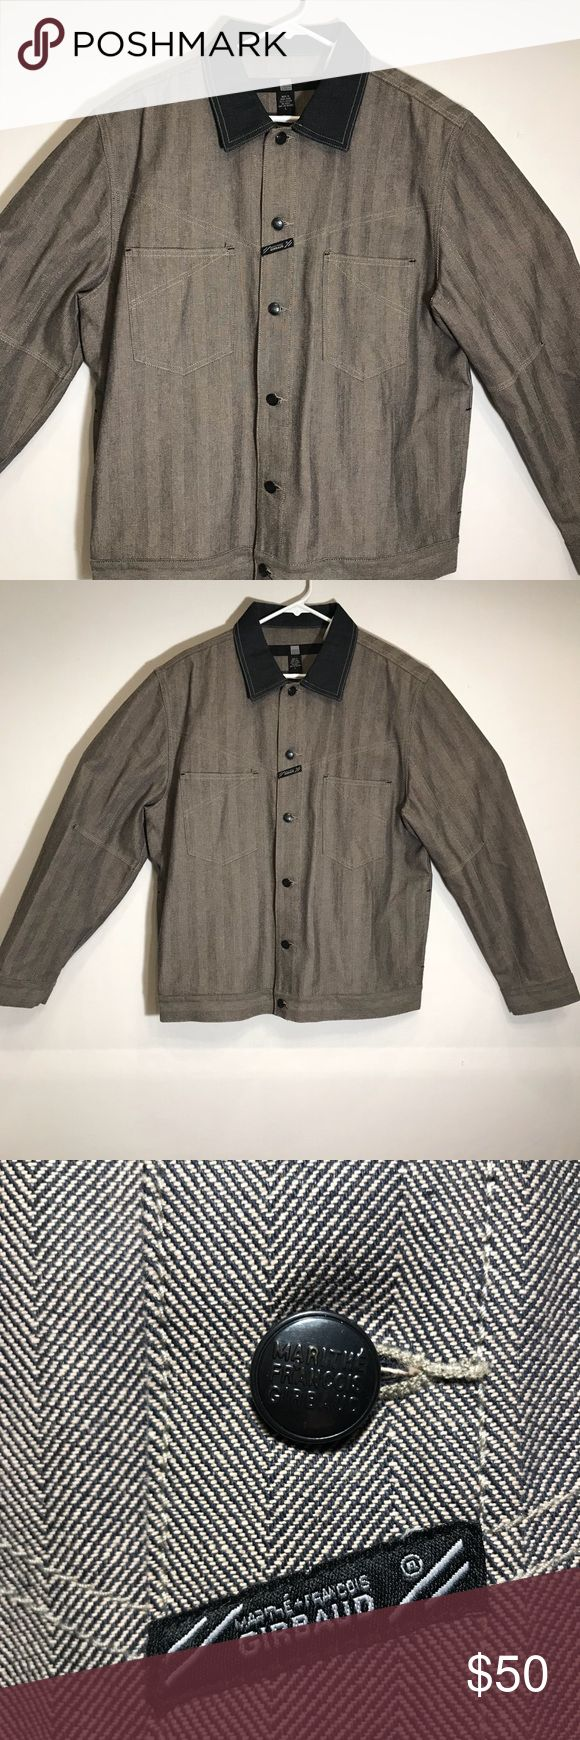 marithe francois girbaud vintage denim jacket marithe francois girbaud vintage denim jacket mens size large  gently used marithe francois girbaud Jackets & Coats